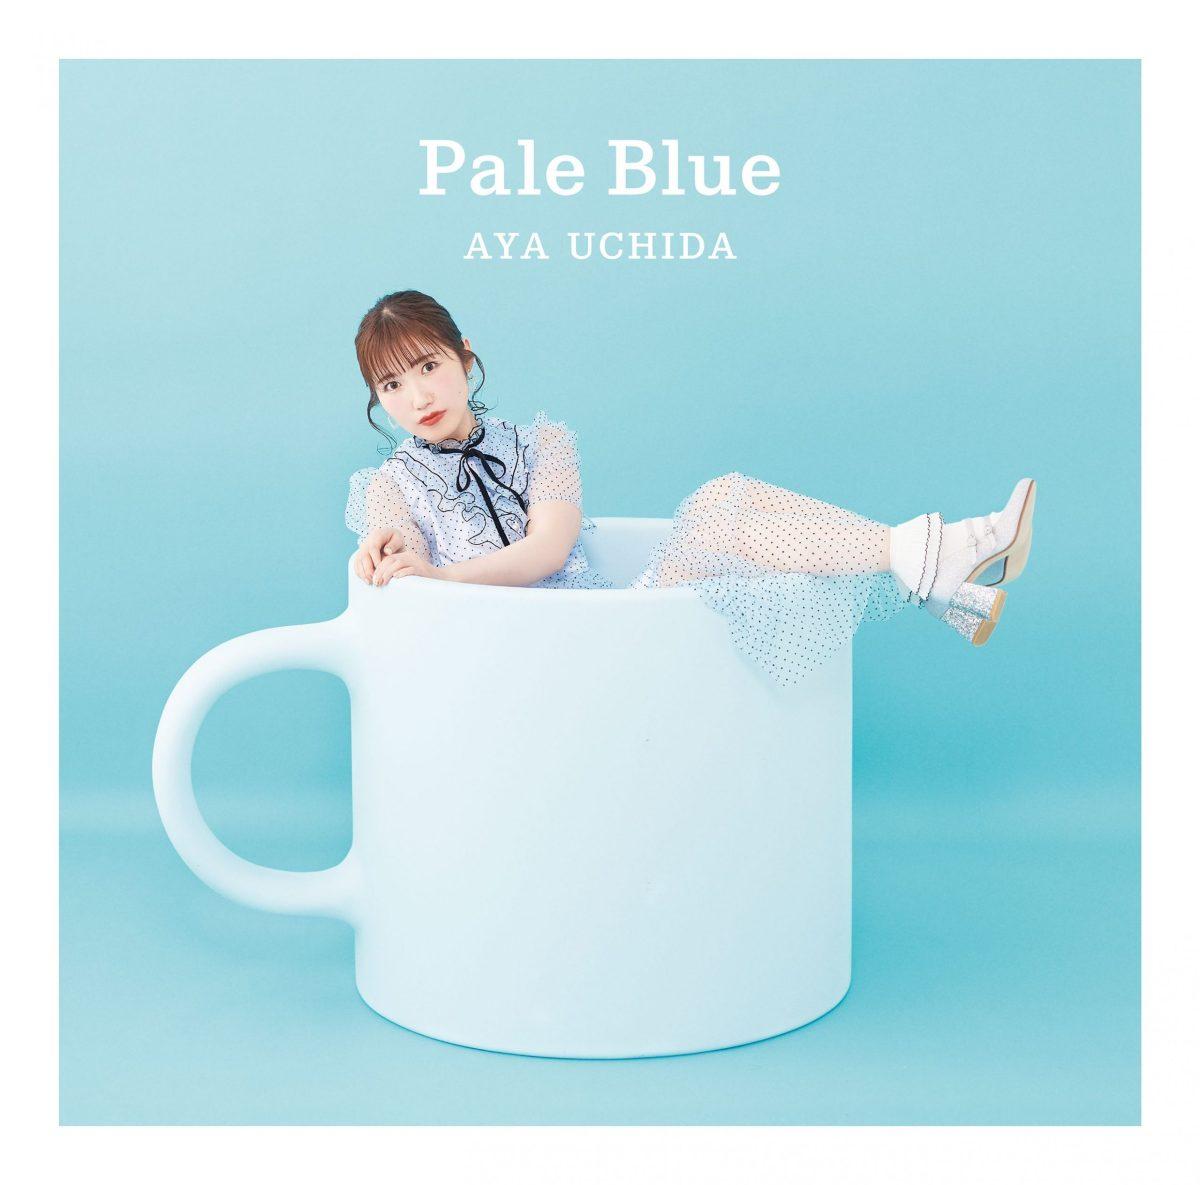 Aya Uchida Pale Blue 2